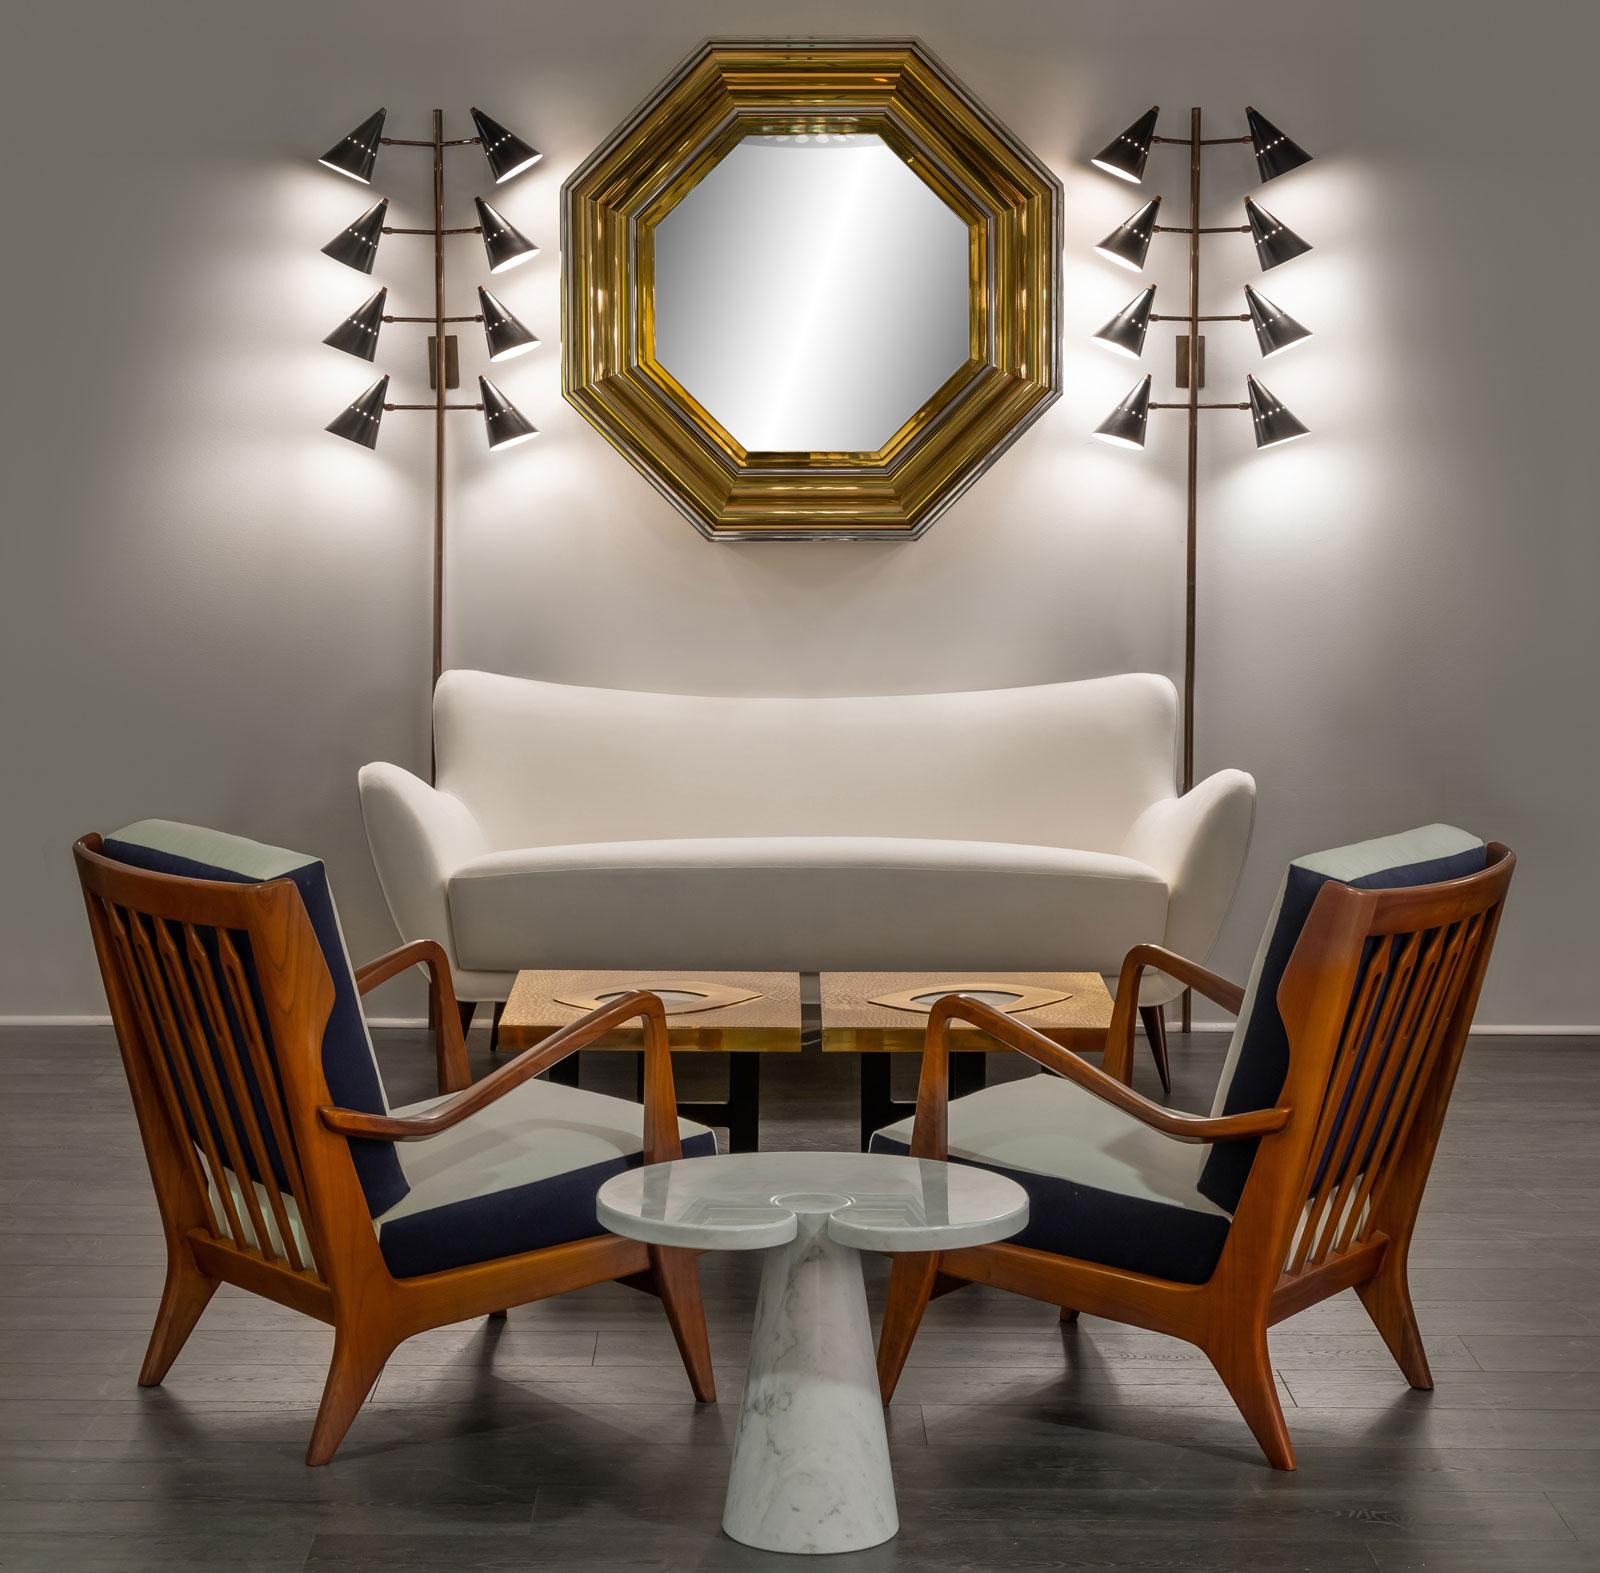 ponti-armchairs-perla-sofa-optimized by  | soyun k.